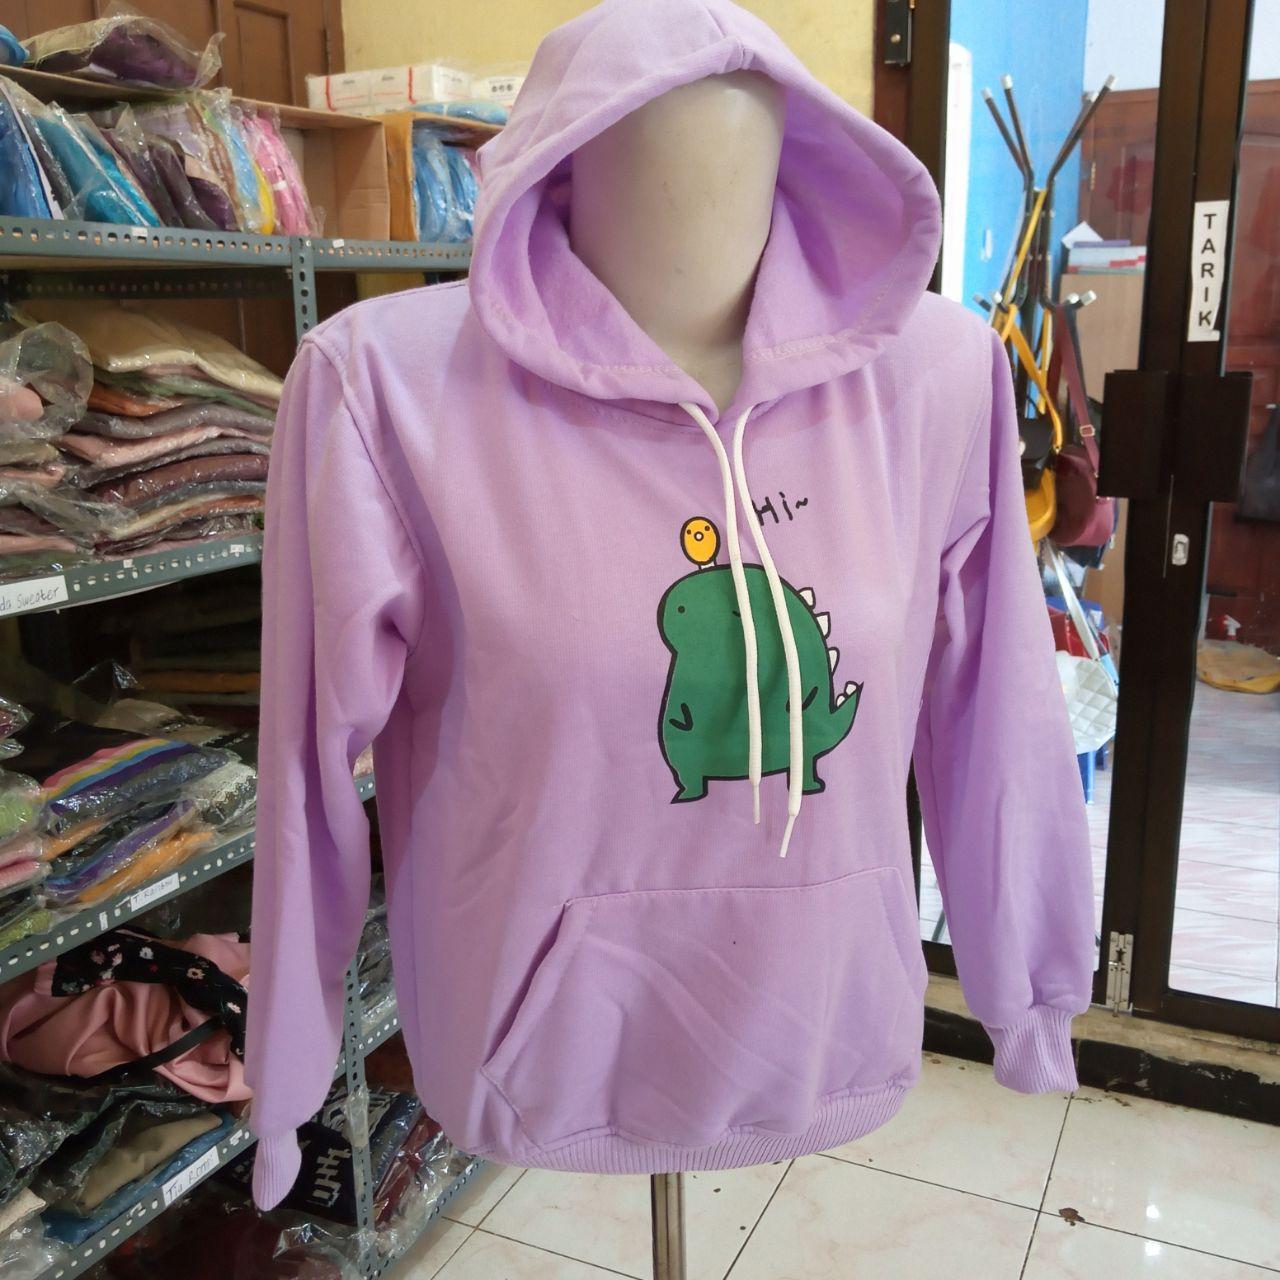 ini adalah Jaket Anak Dinosaurus Lilac, size: LD +- 78cm, material: Fleece, color: Purple, brand: JaketAnakIndonesia, age_group: kids, gender: unisex